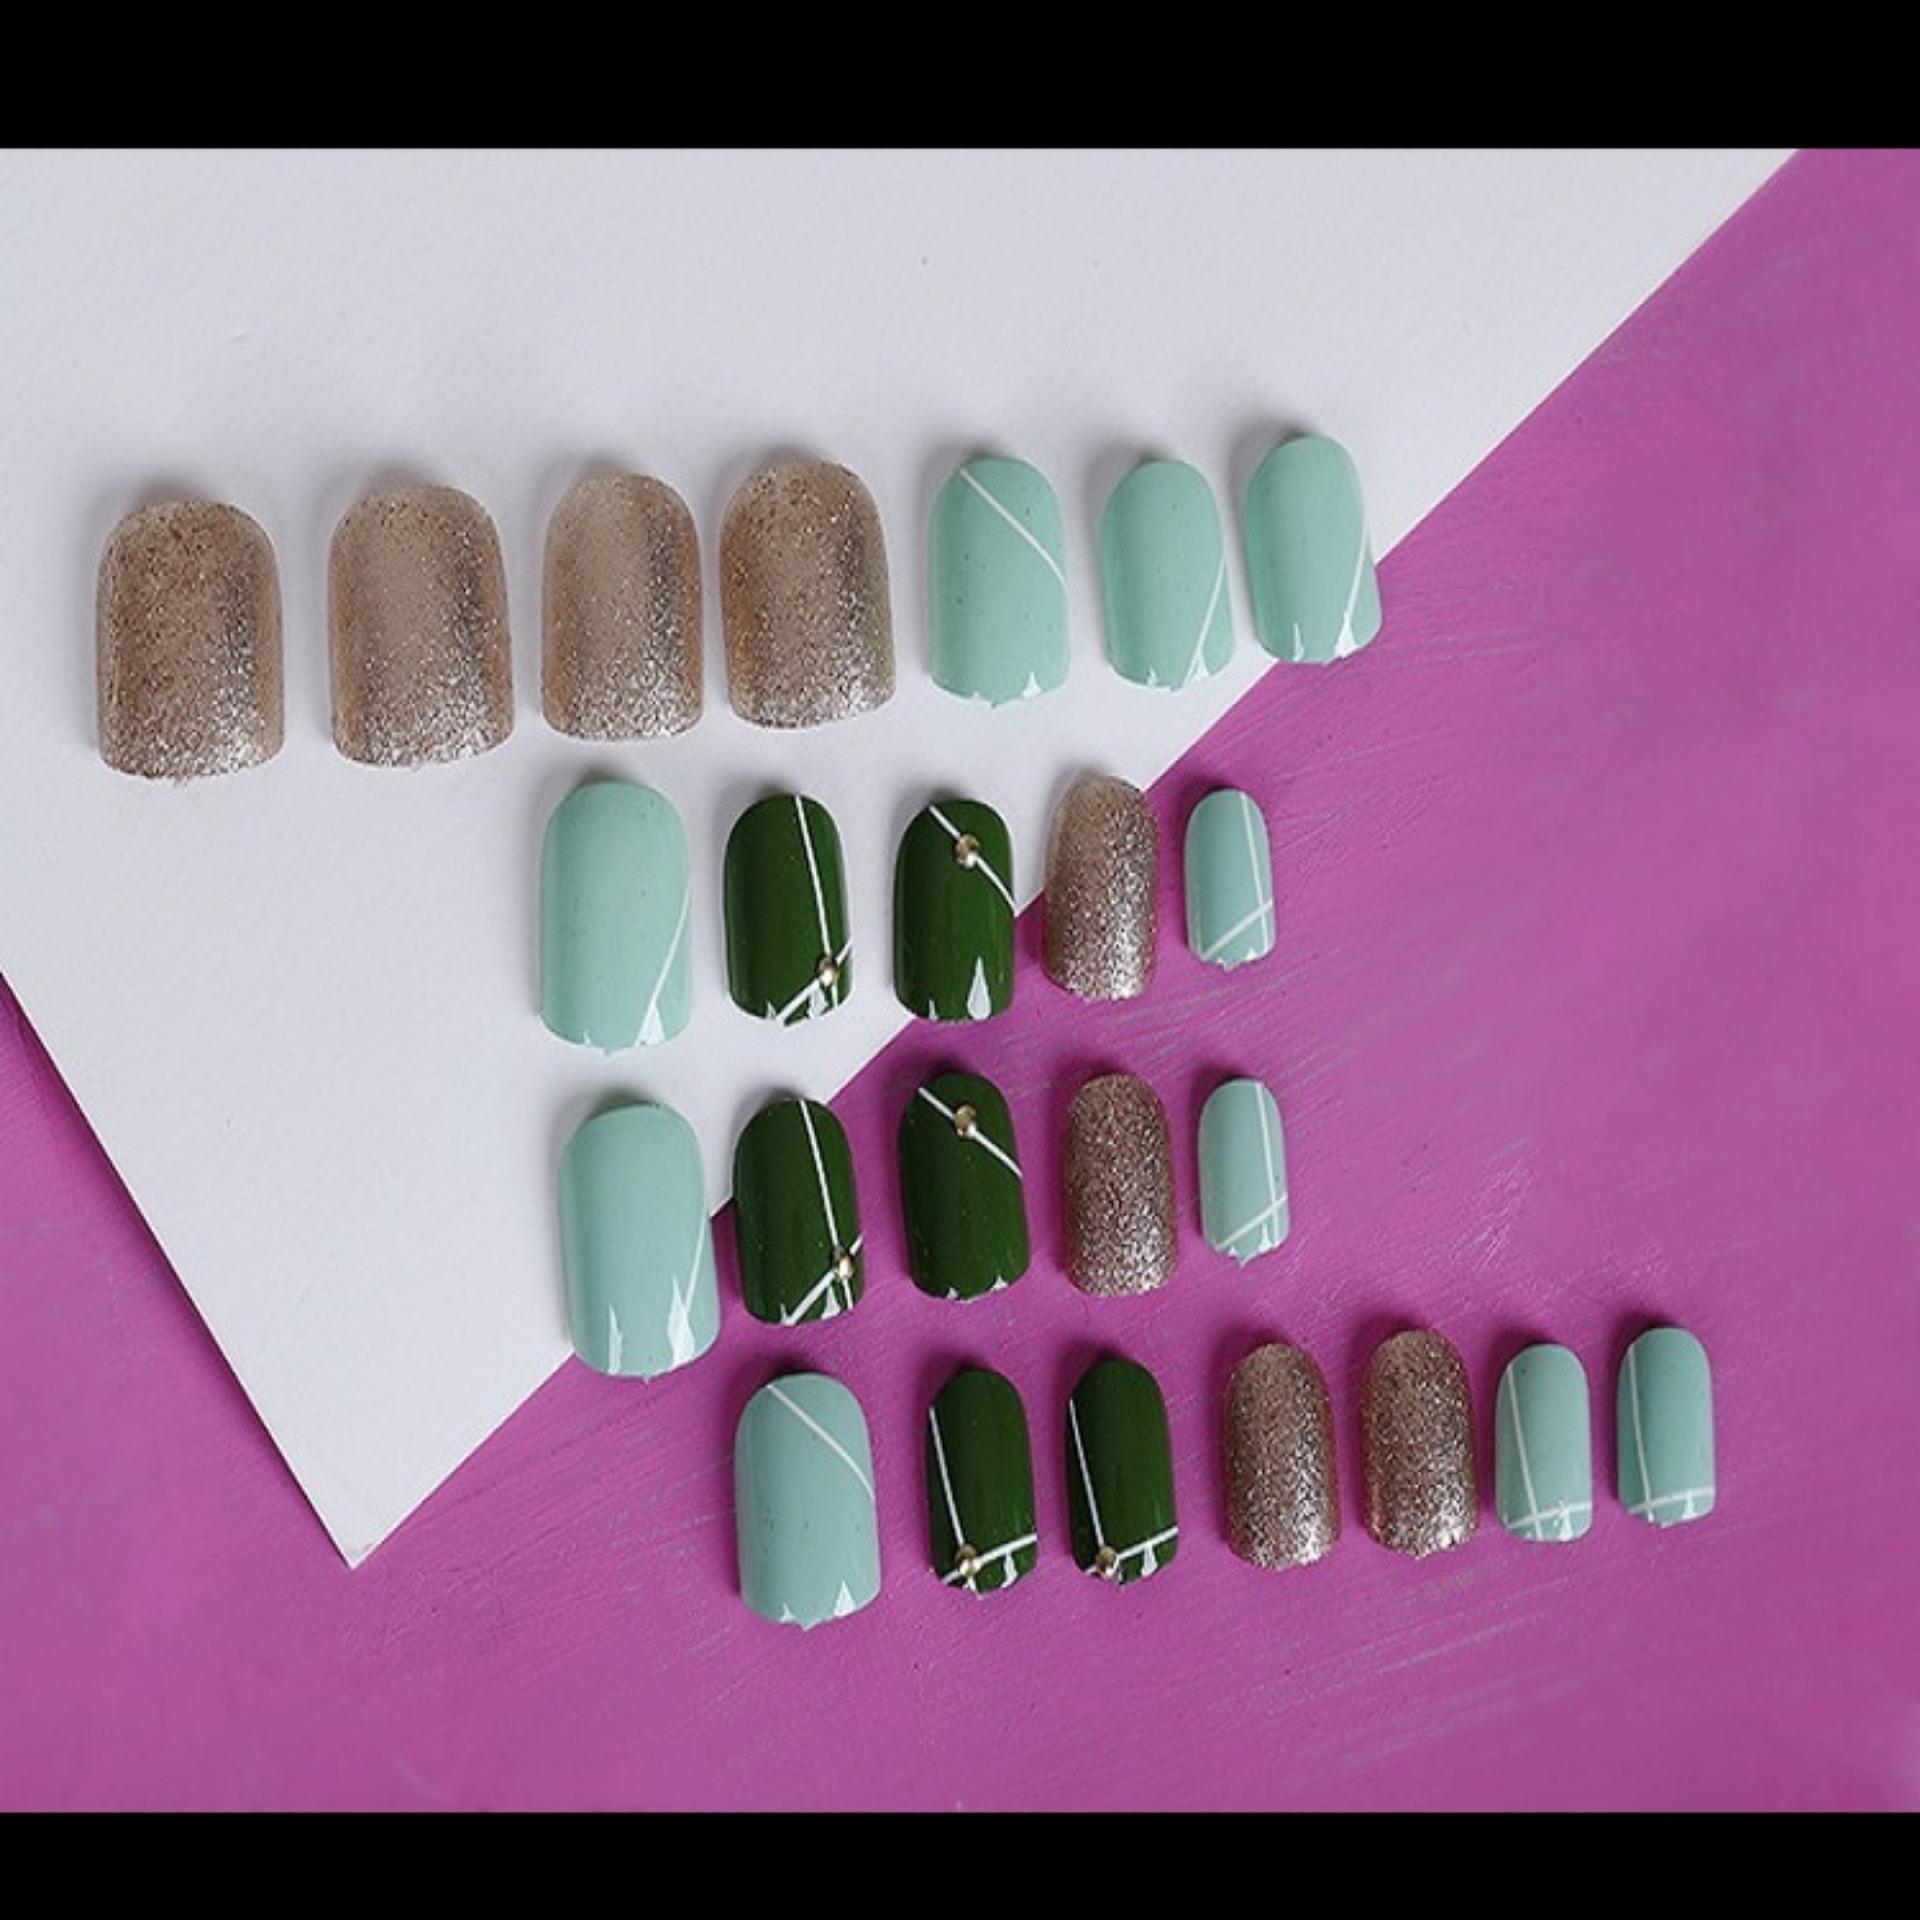 Lihat Jbs Nails Kuku Palsu Pengantin Warna 3d A3 Dan Harga Terbaru Wedding A39 4